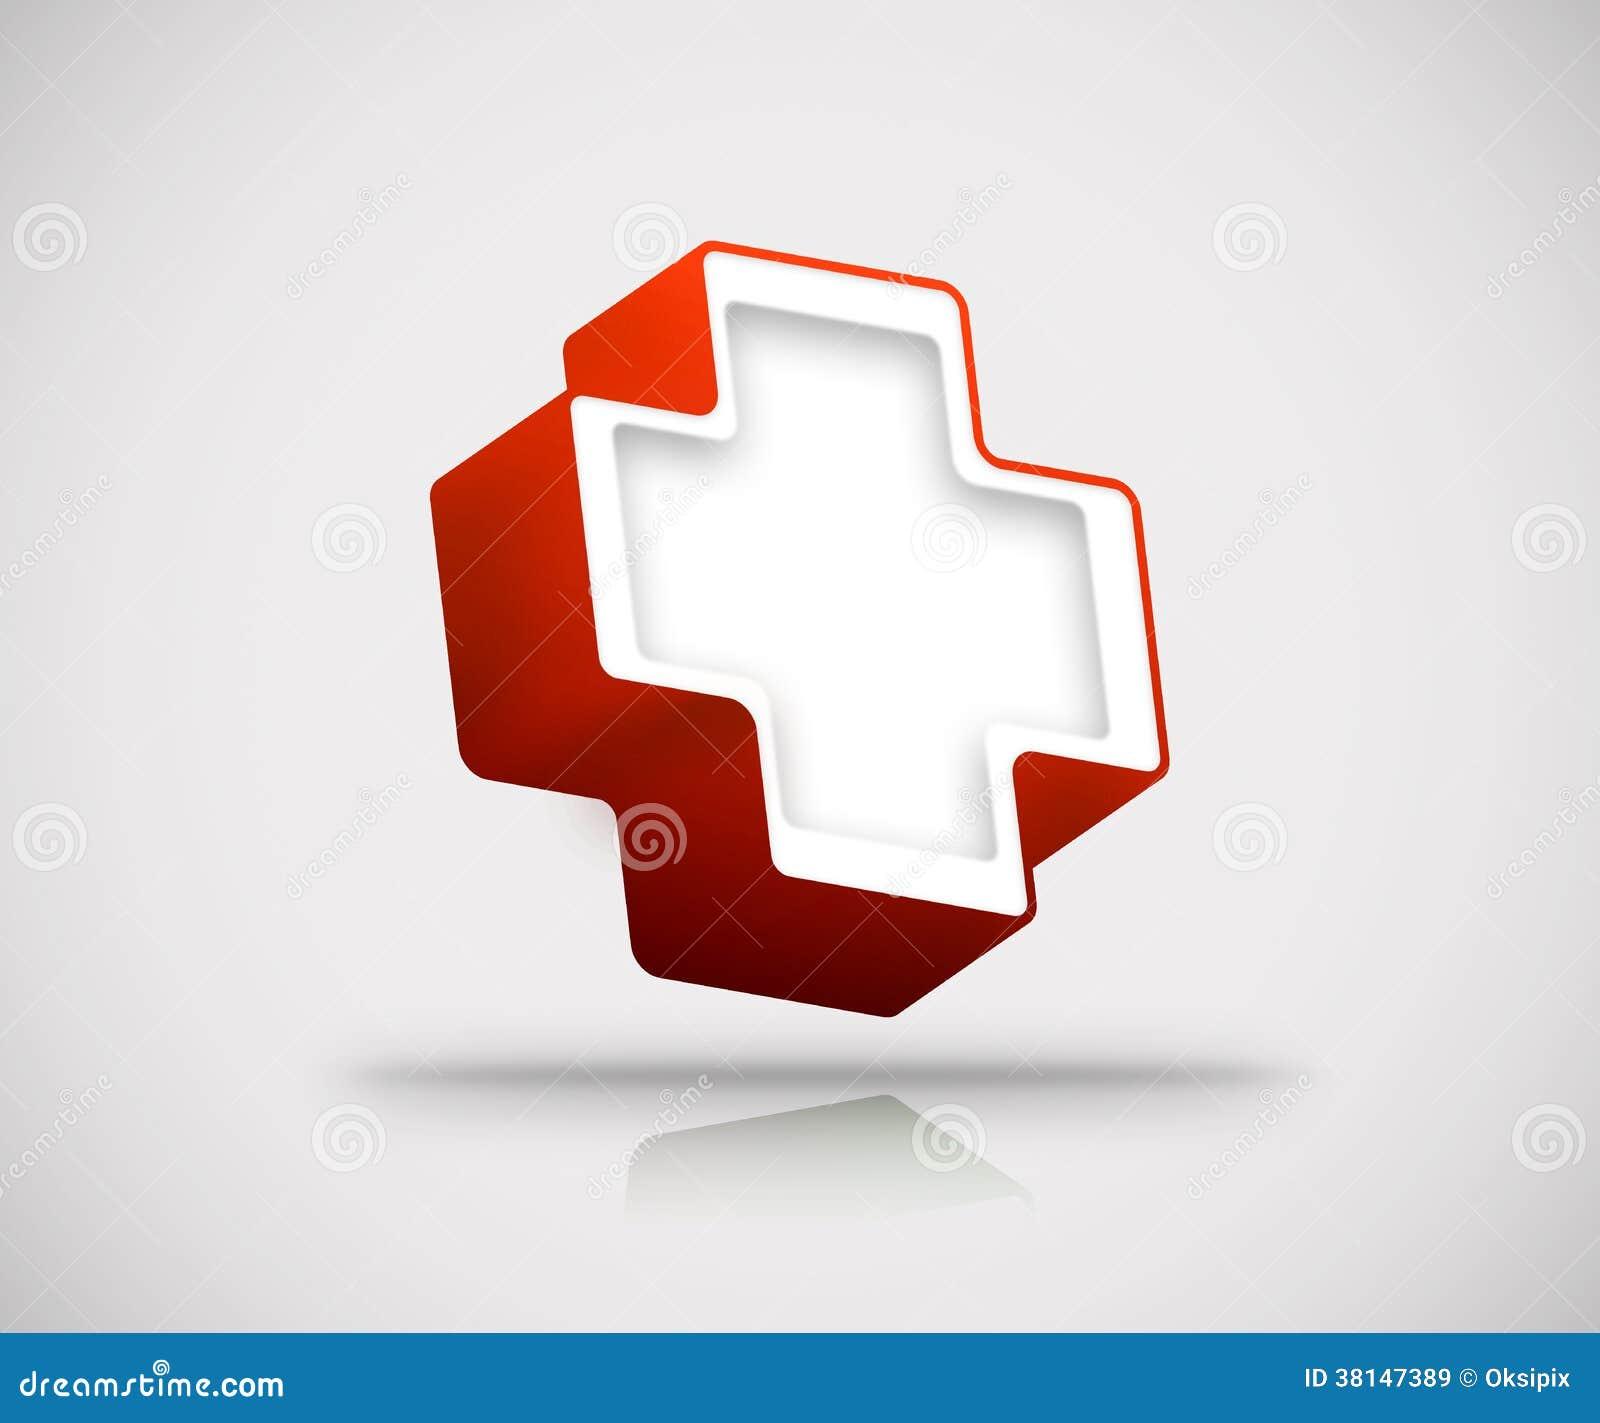 3d red cross stock illustration  Illustration of shadow